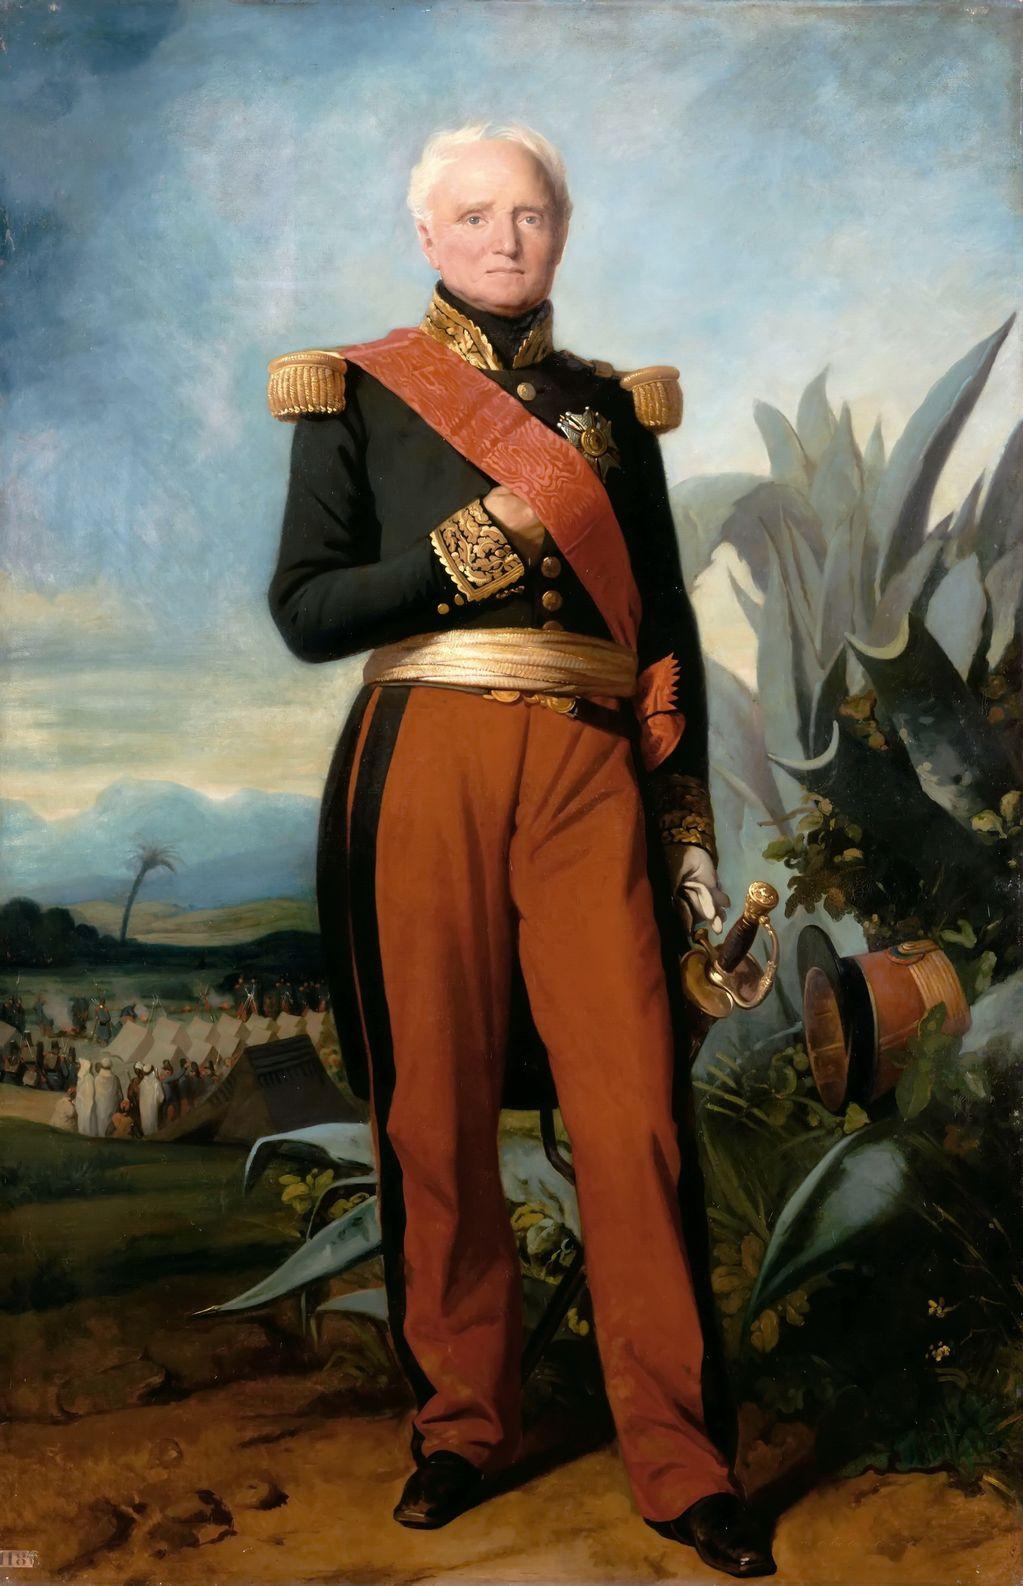 Marshal Thomas Bugeaud (1784-1849), duc d'Isly, maréchal de France